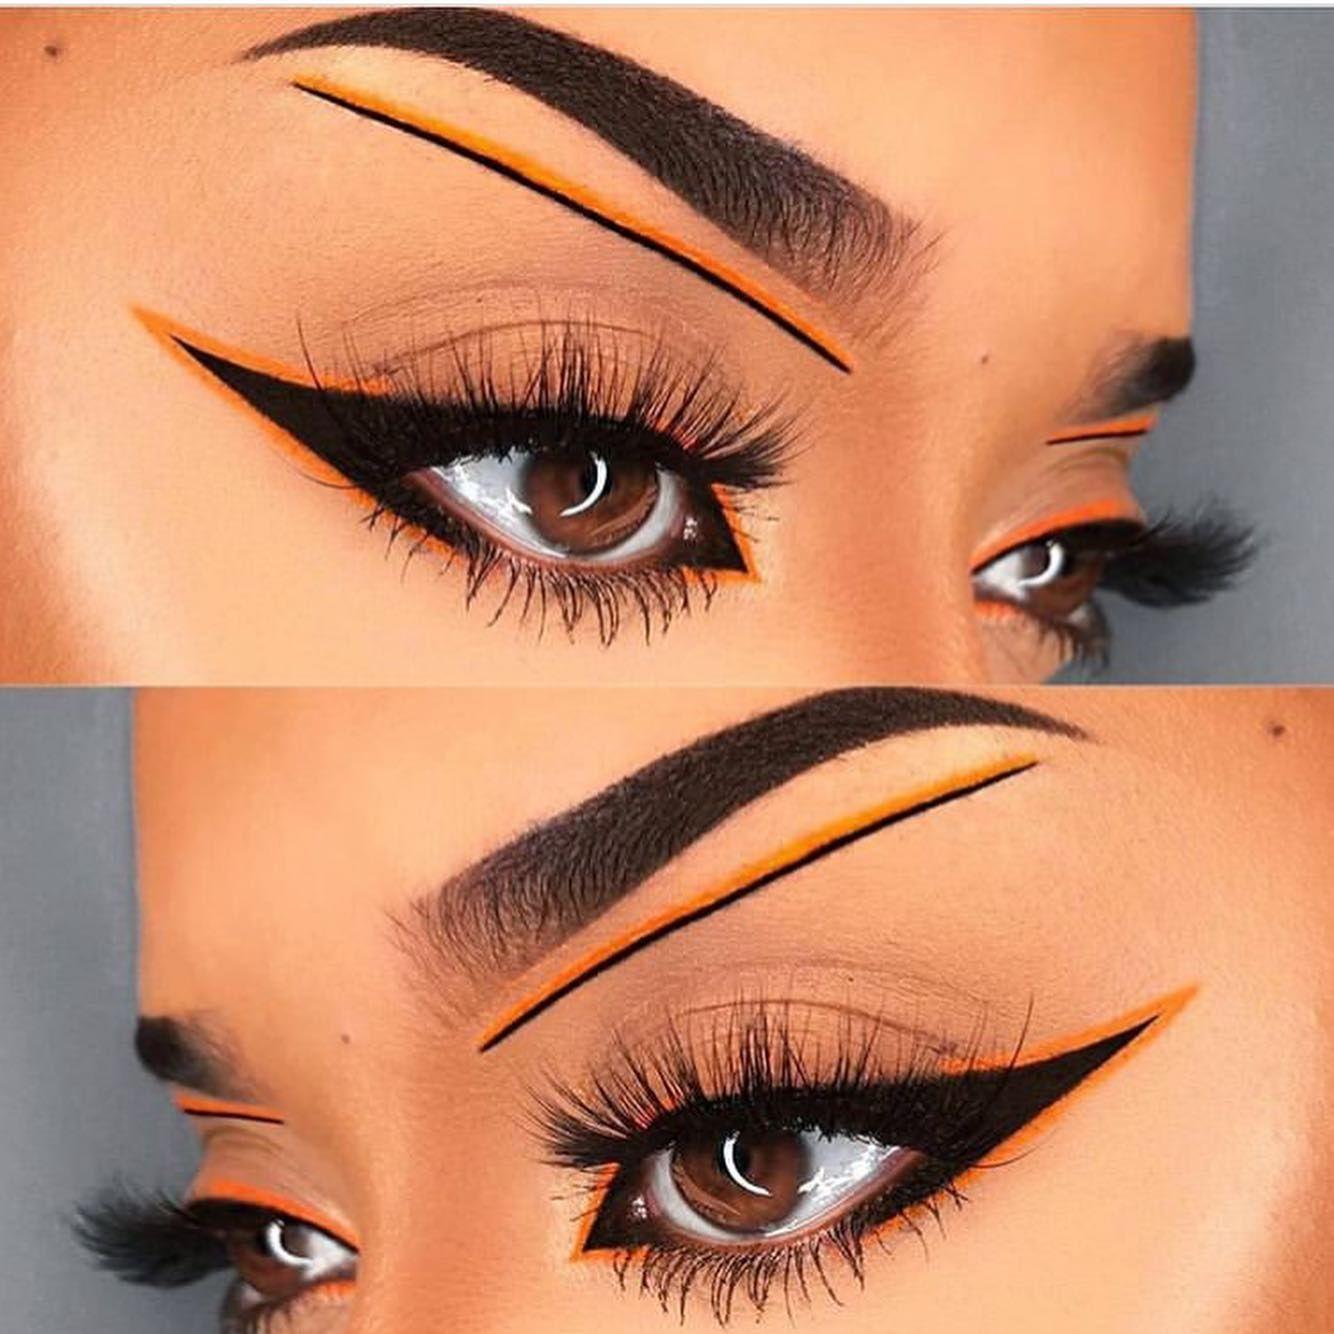 Fav Look 1 7 Comment Below Follow Tag Miaadoramakeup For A Chance To Be Featured Credits To Atarahmayhew D Makeup Dipbrow Makeup Hacks Diy